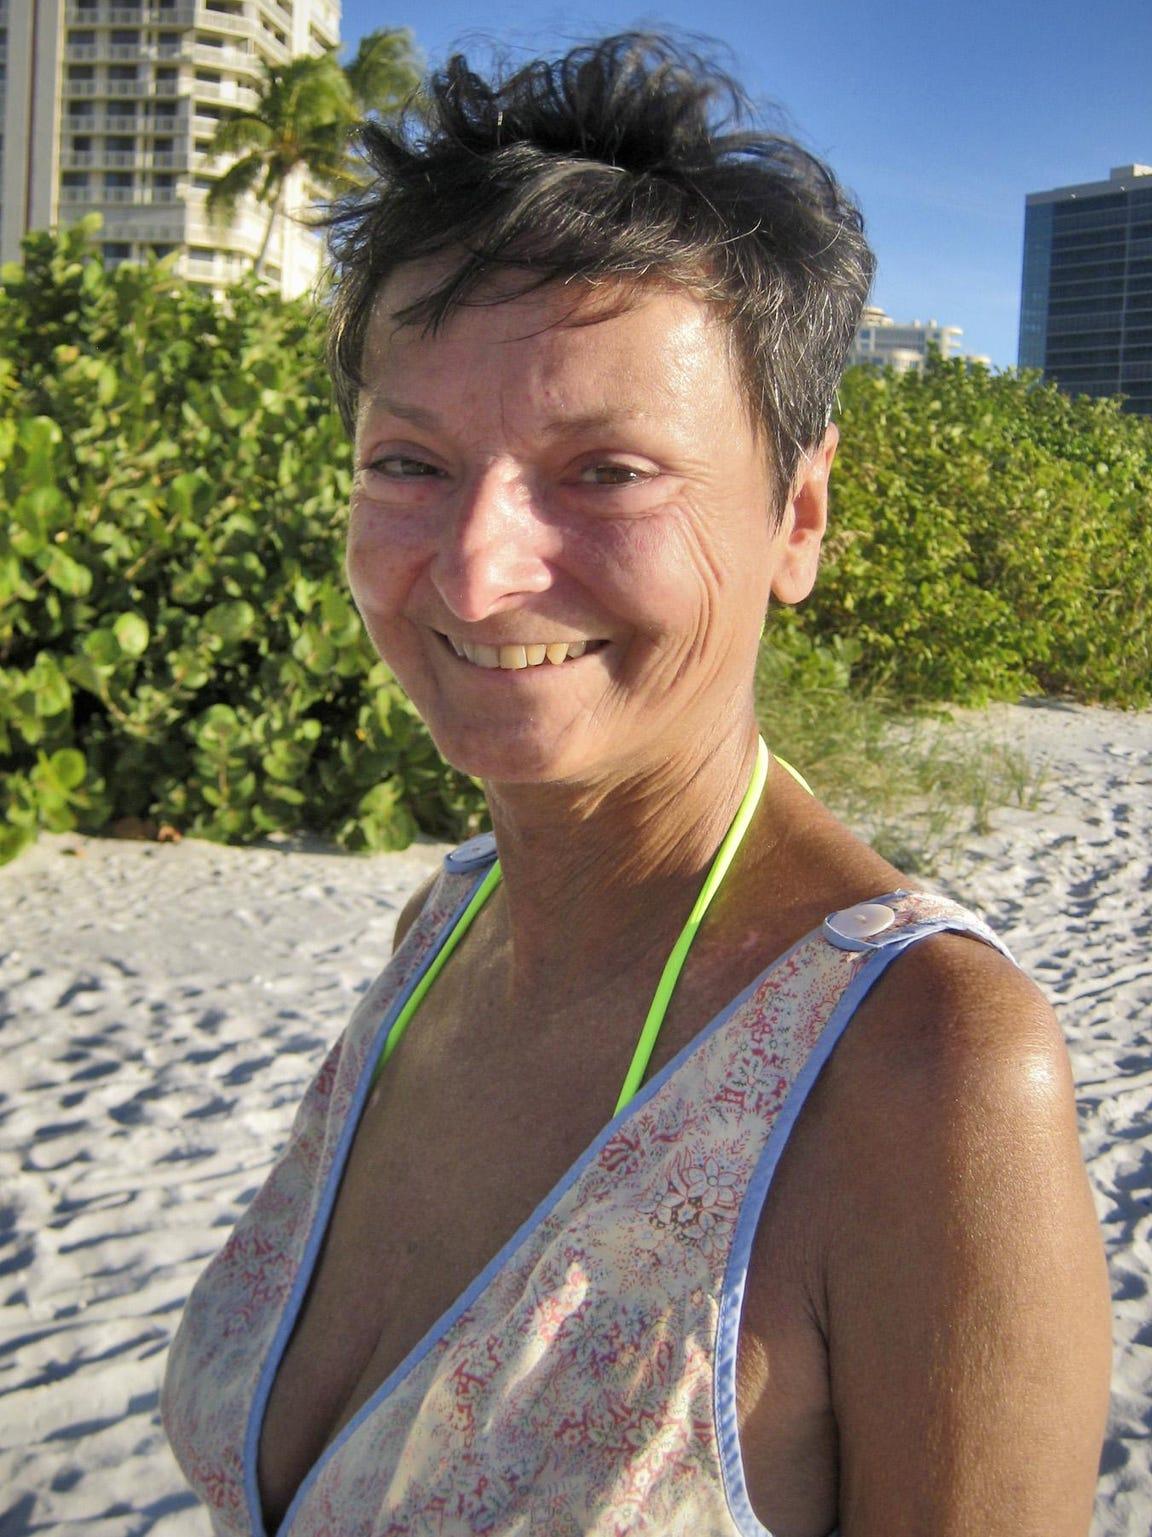 Minneapolis resident Judy Gallas was born Georgia Stathopoulos